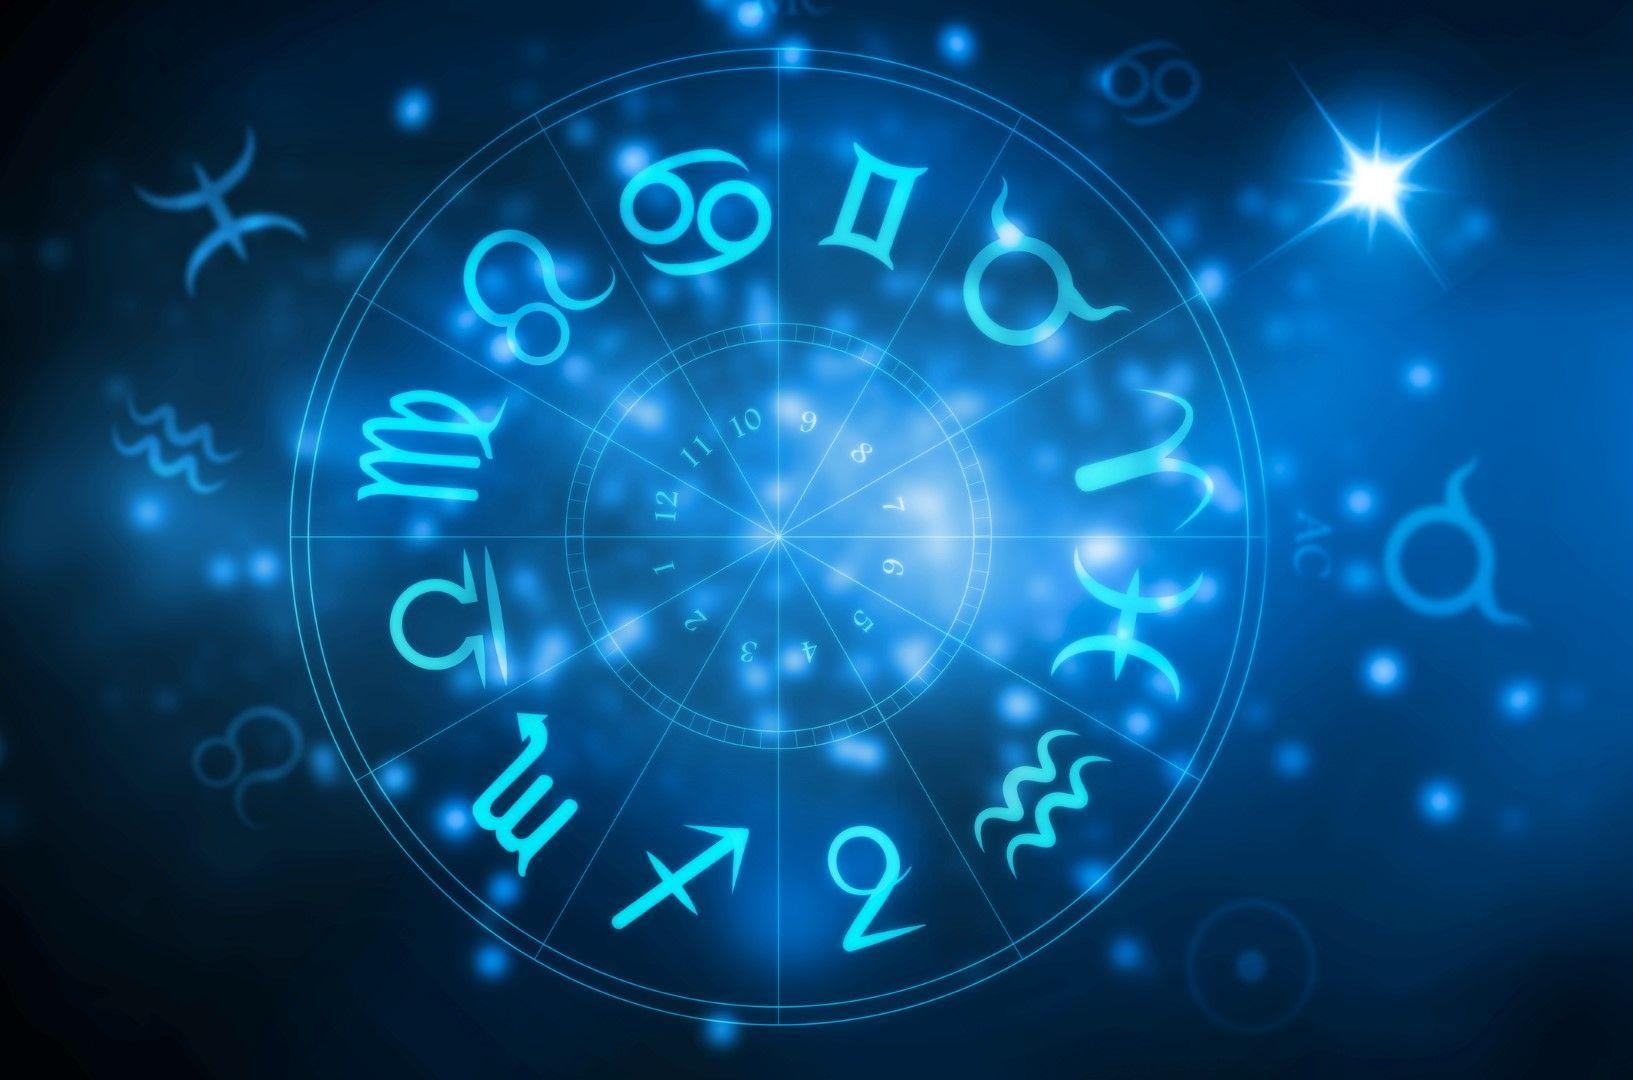 Segni zodiacali cardinali fissi e mobili tgcom